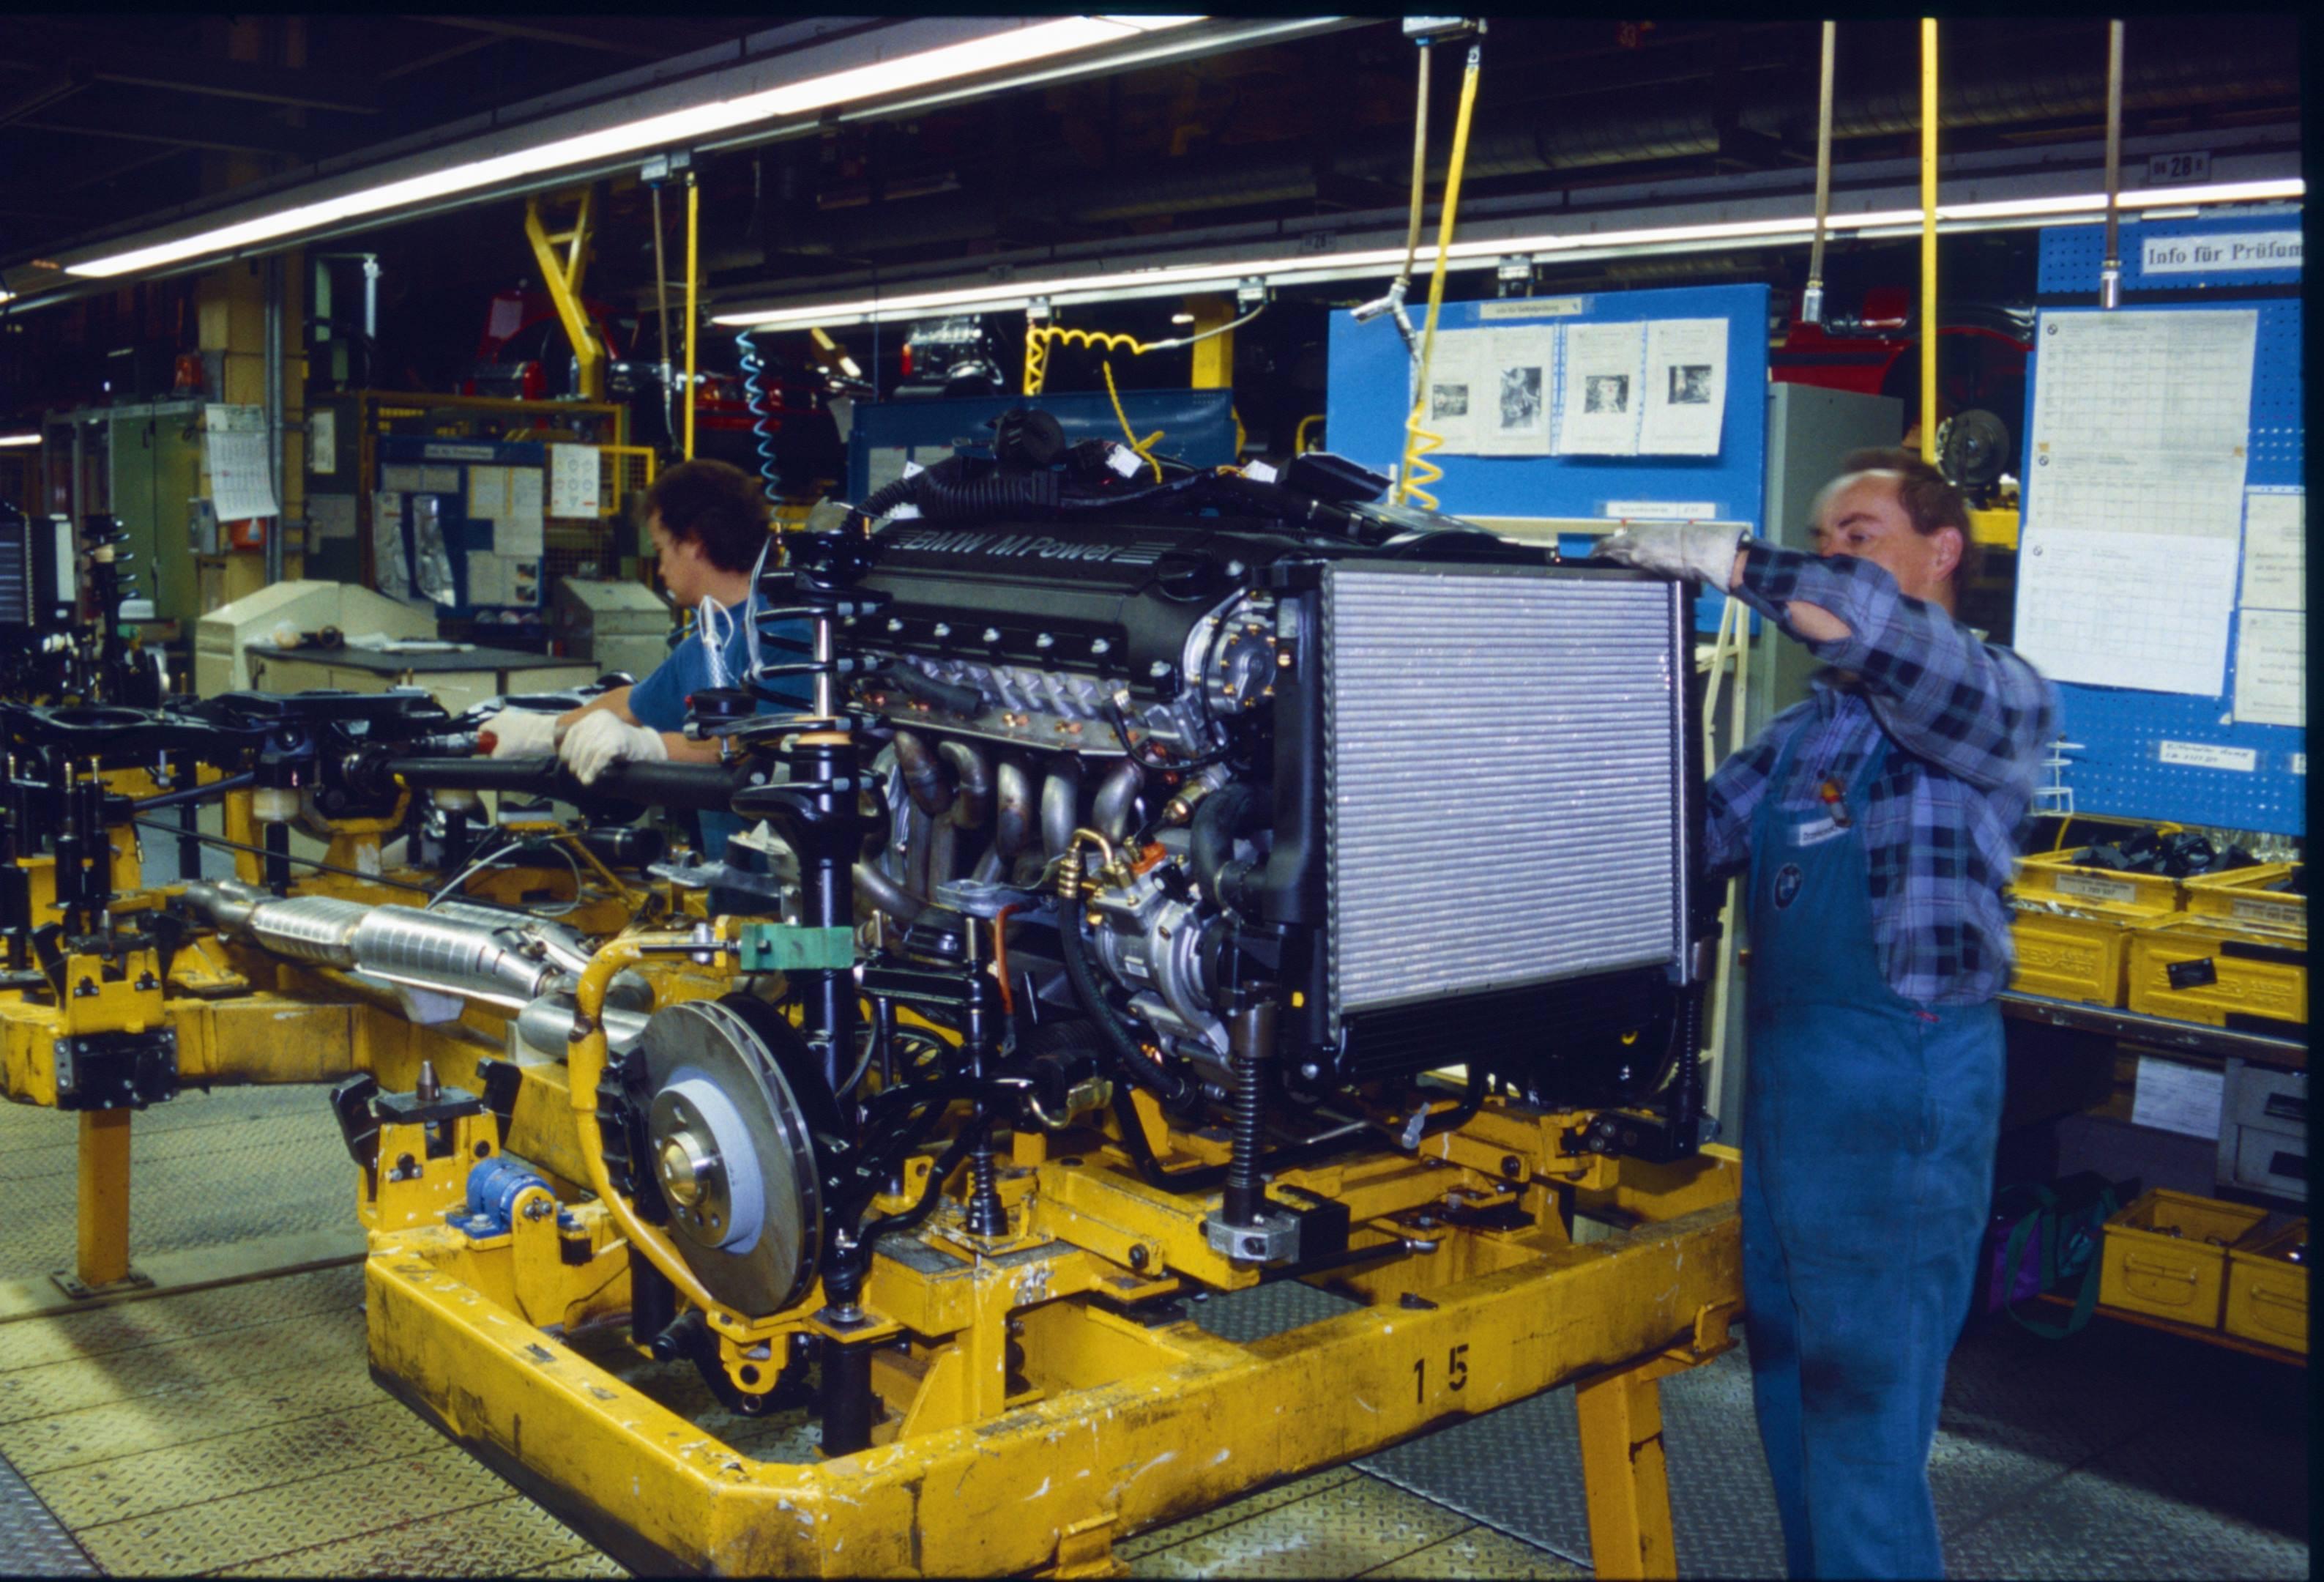 BMW E36 M3 engine production